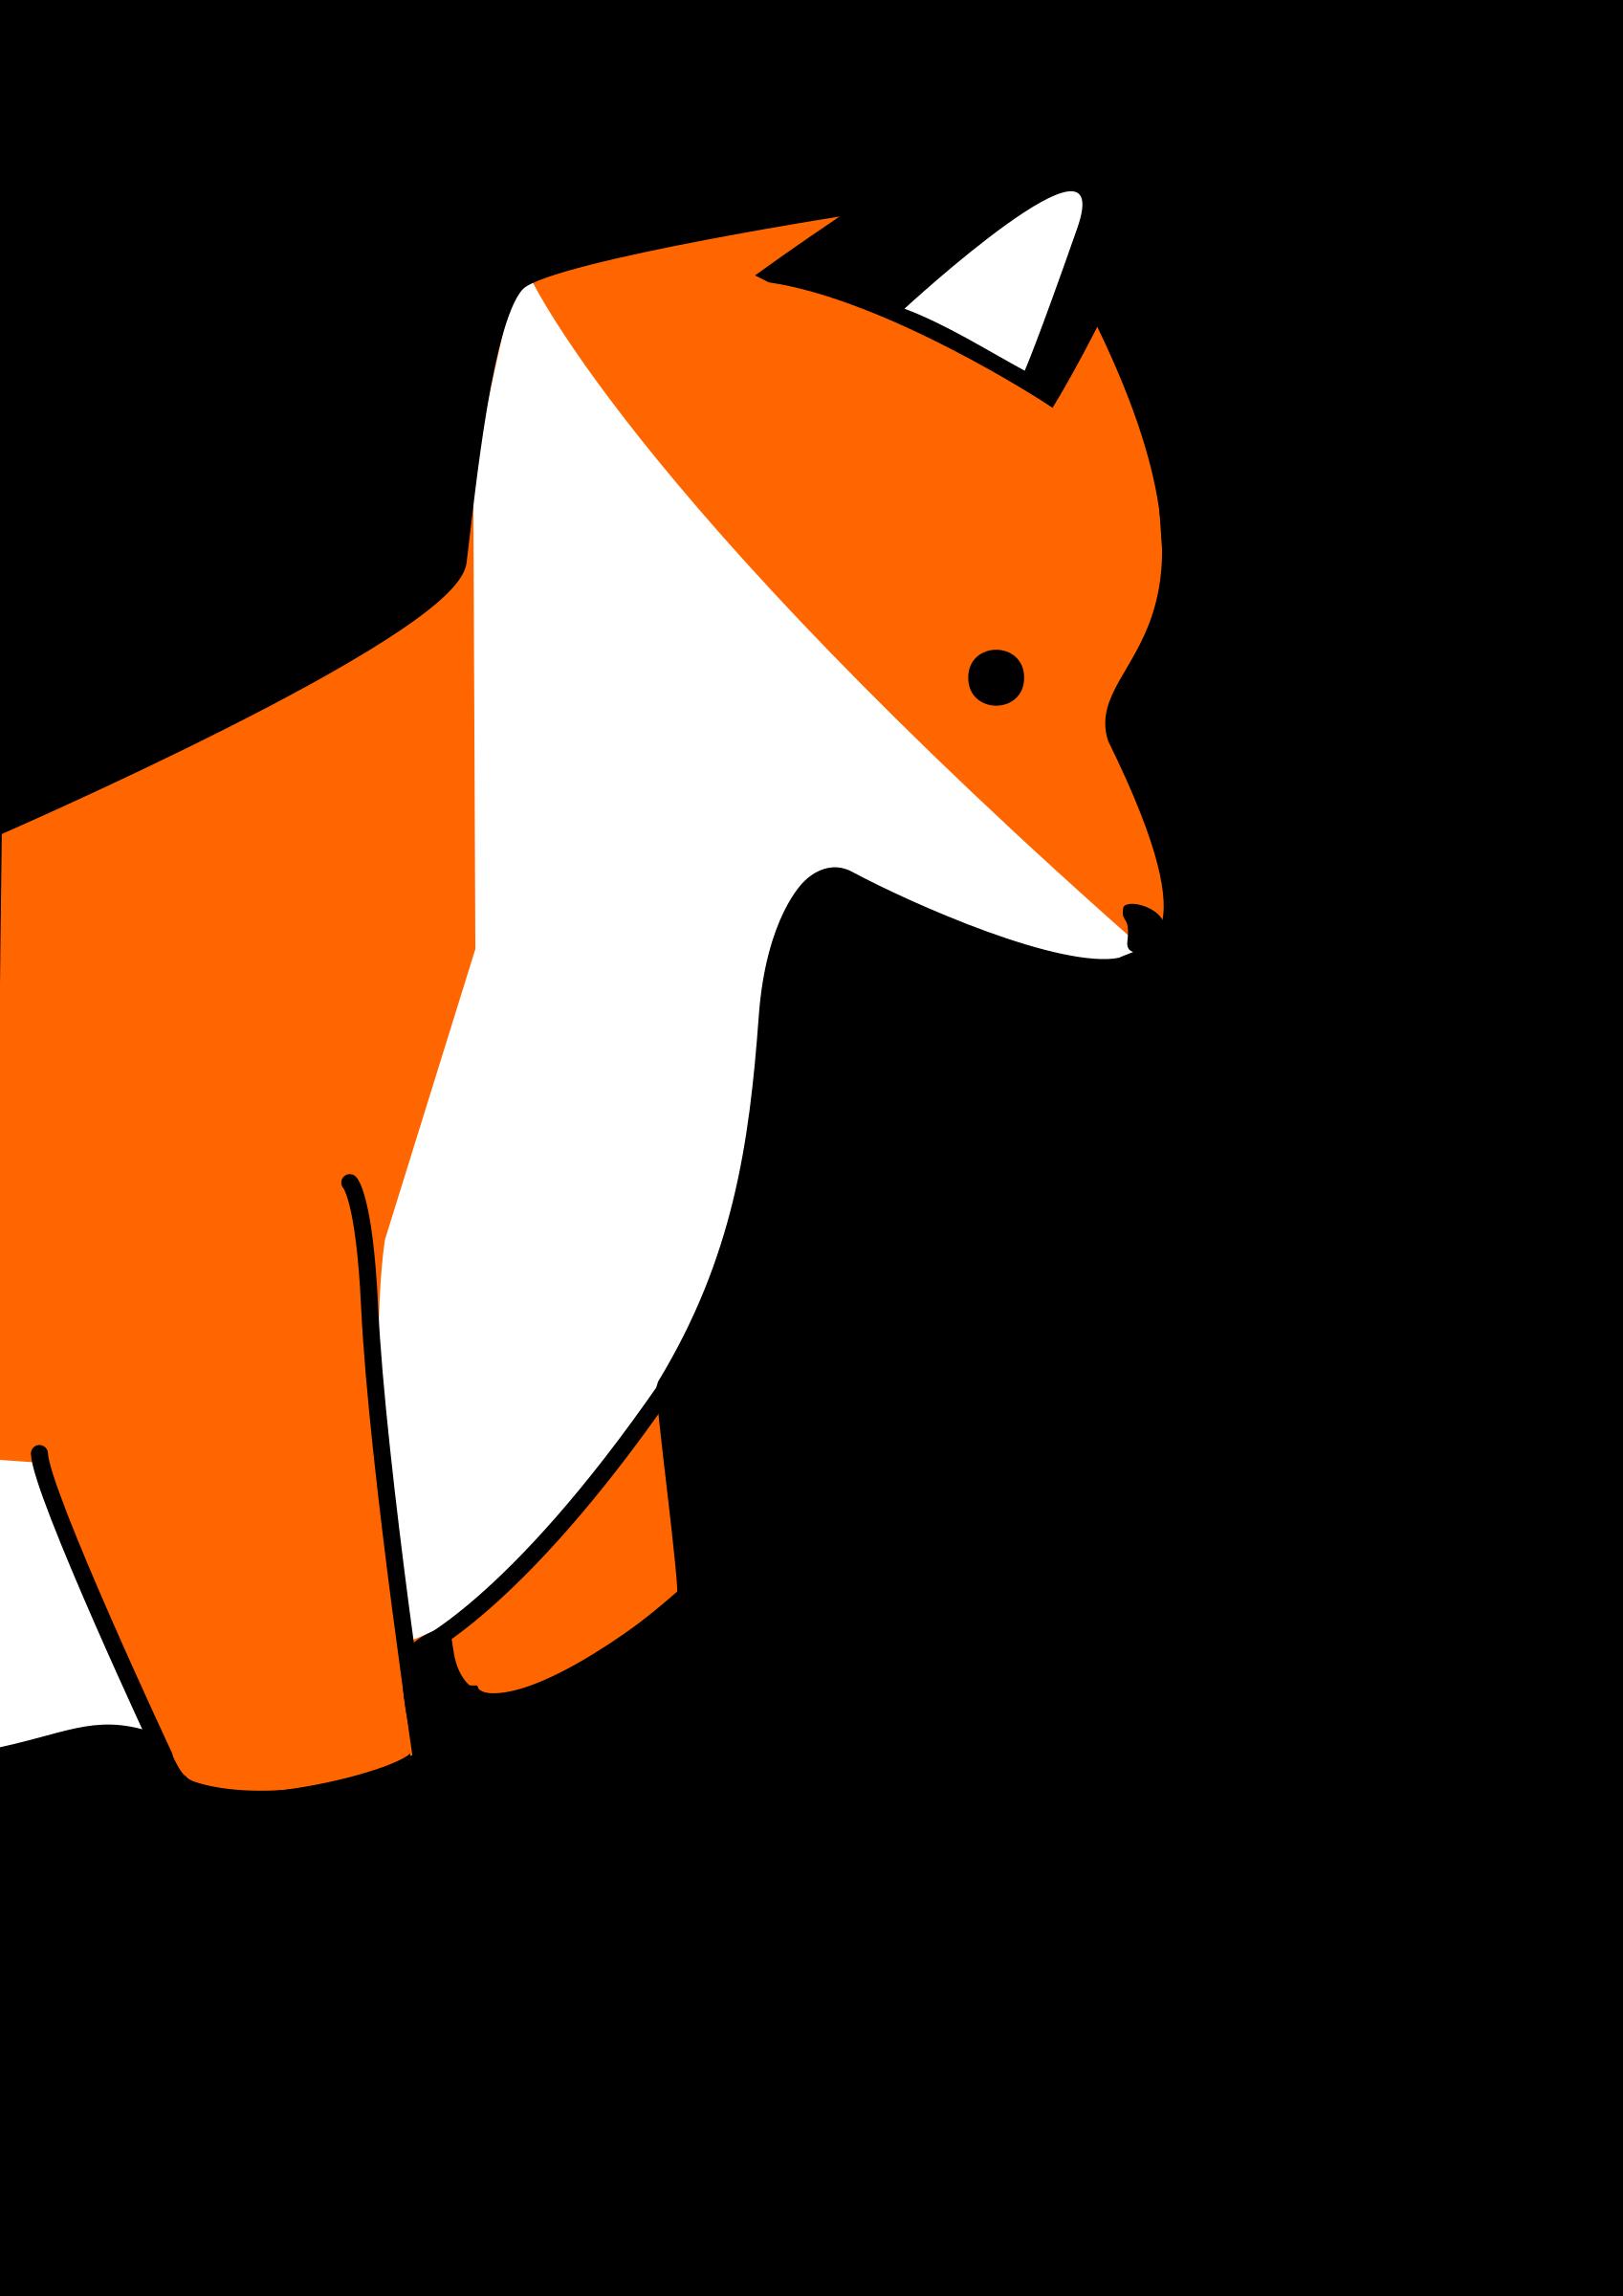 Stupid big image png. Clipart fox small fox